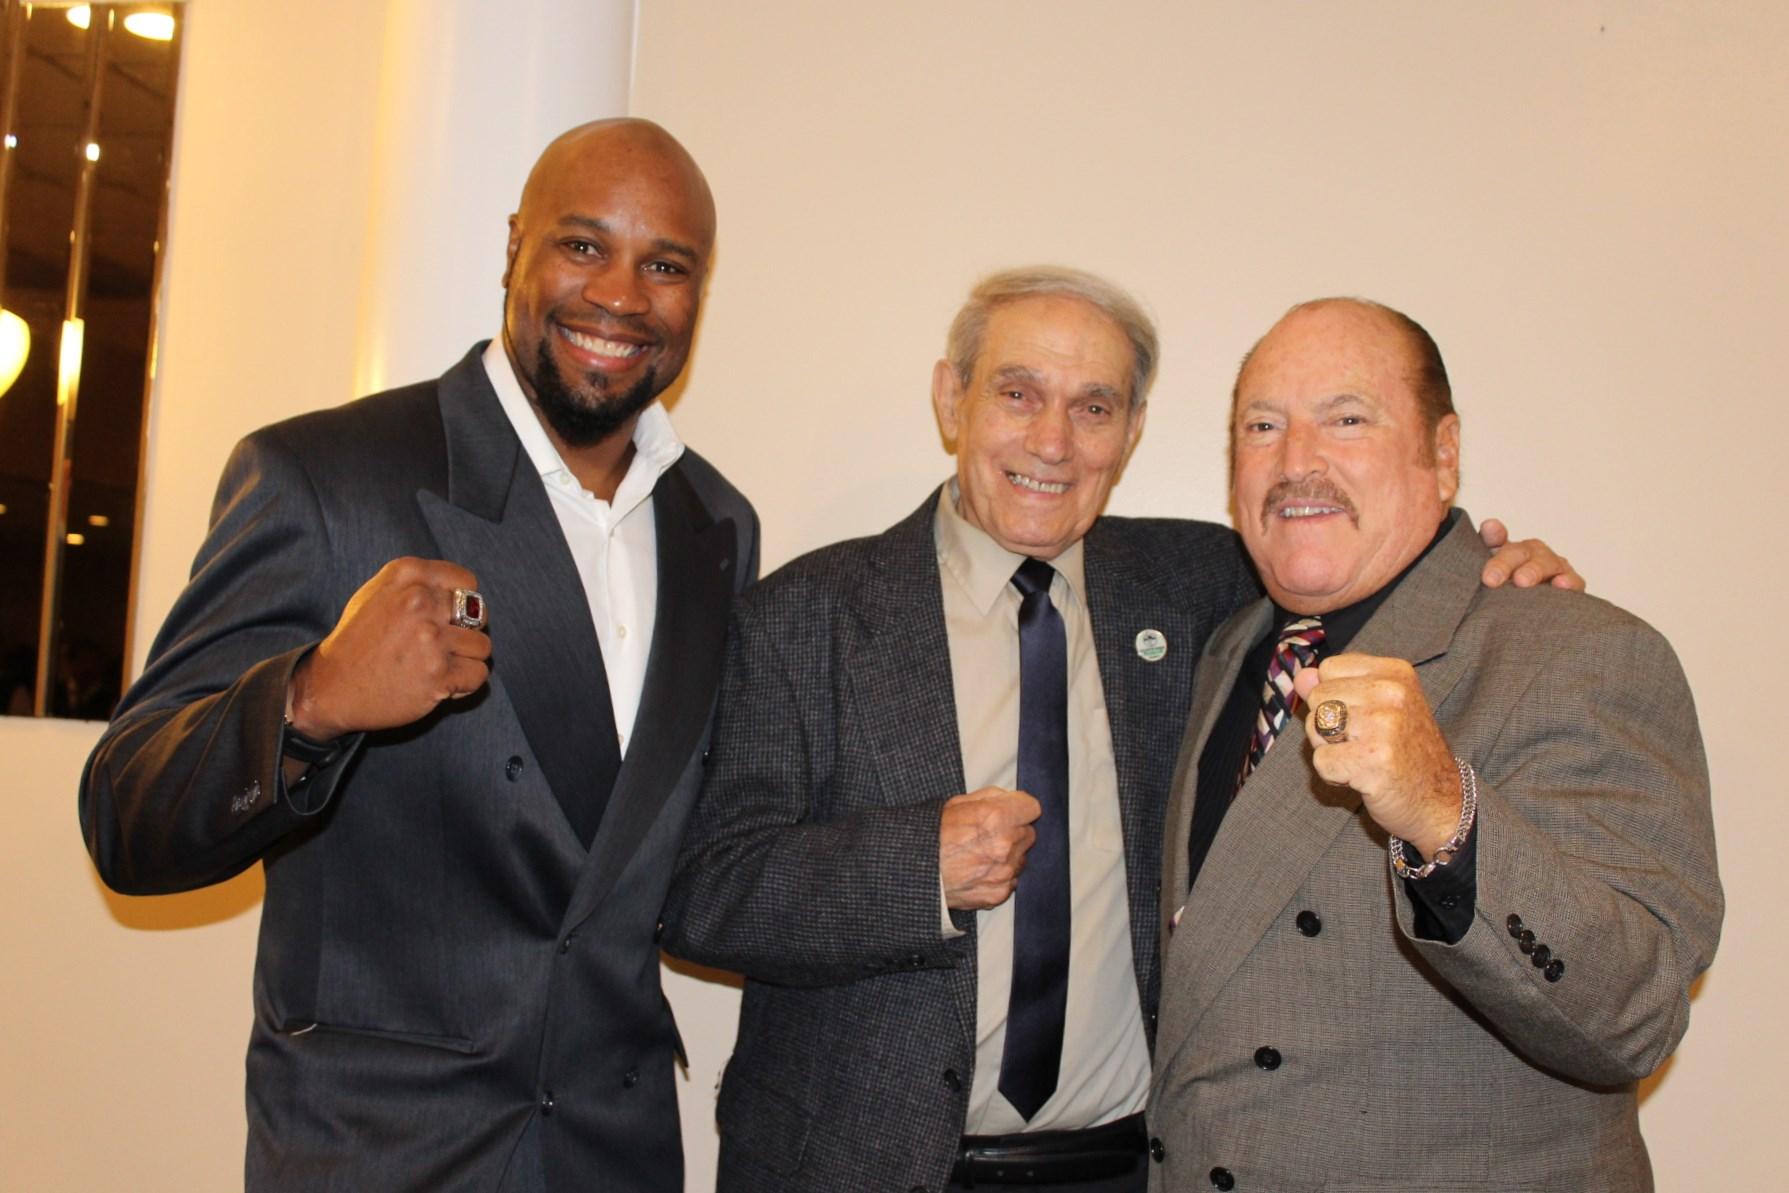 Rochester Boxing Hall of Fame, September 30, 2017